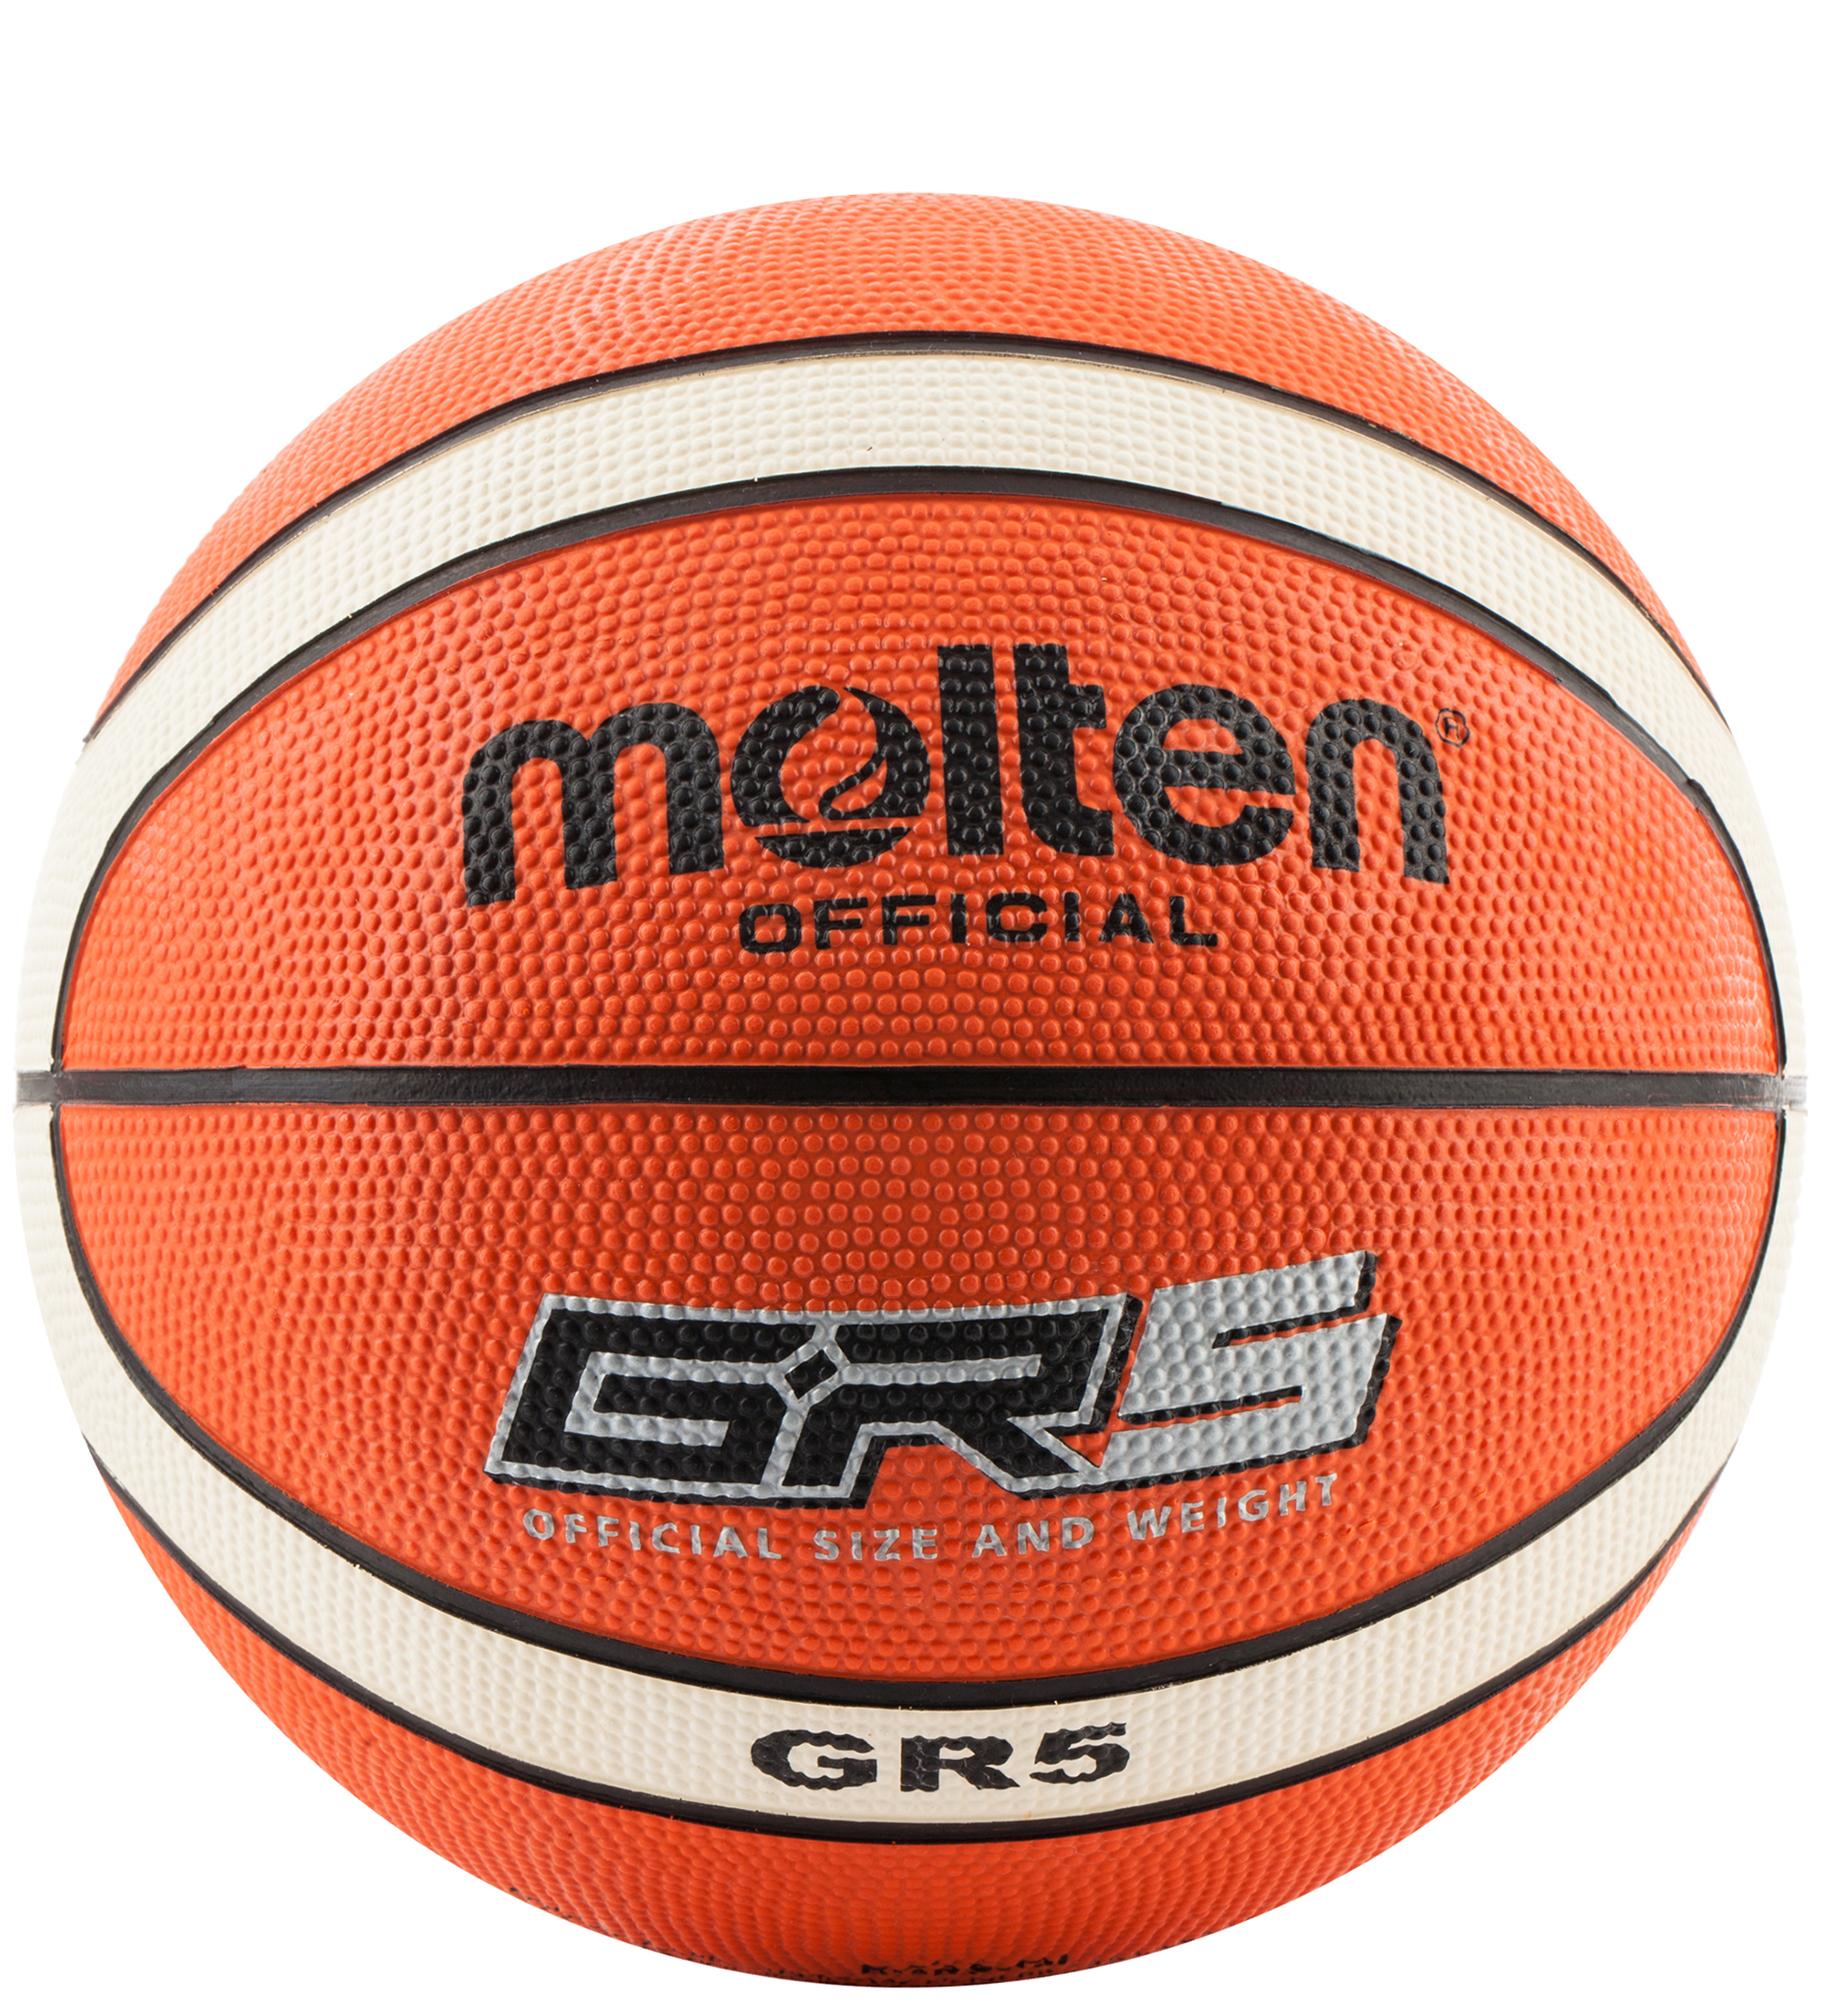 Molten Мяч баскетбольный Molten, размер 5 баскетбольный мяч molten bgr5 р 5 15418